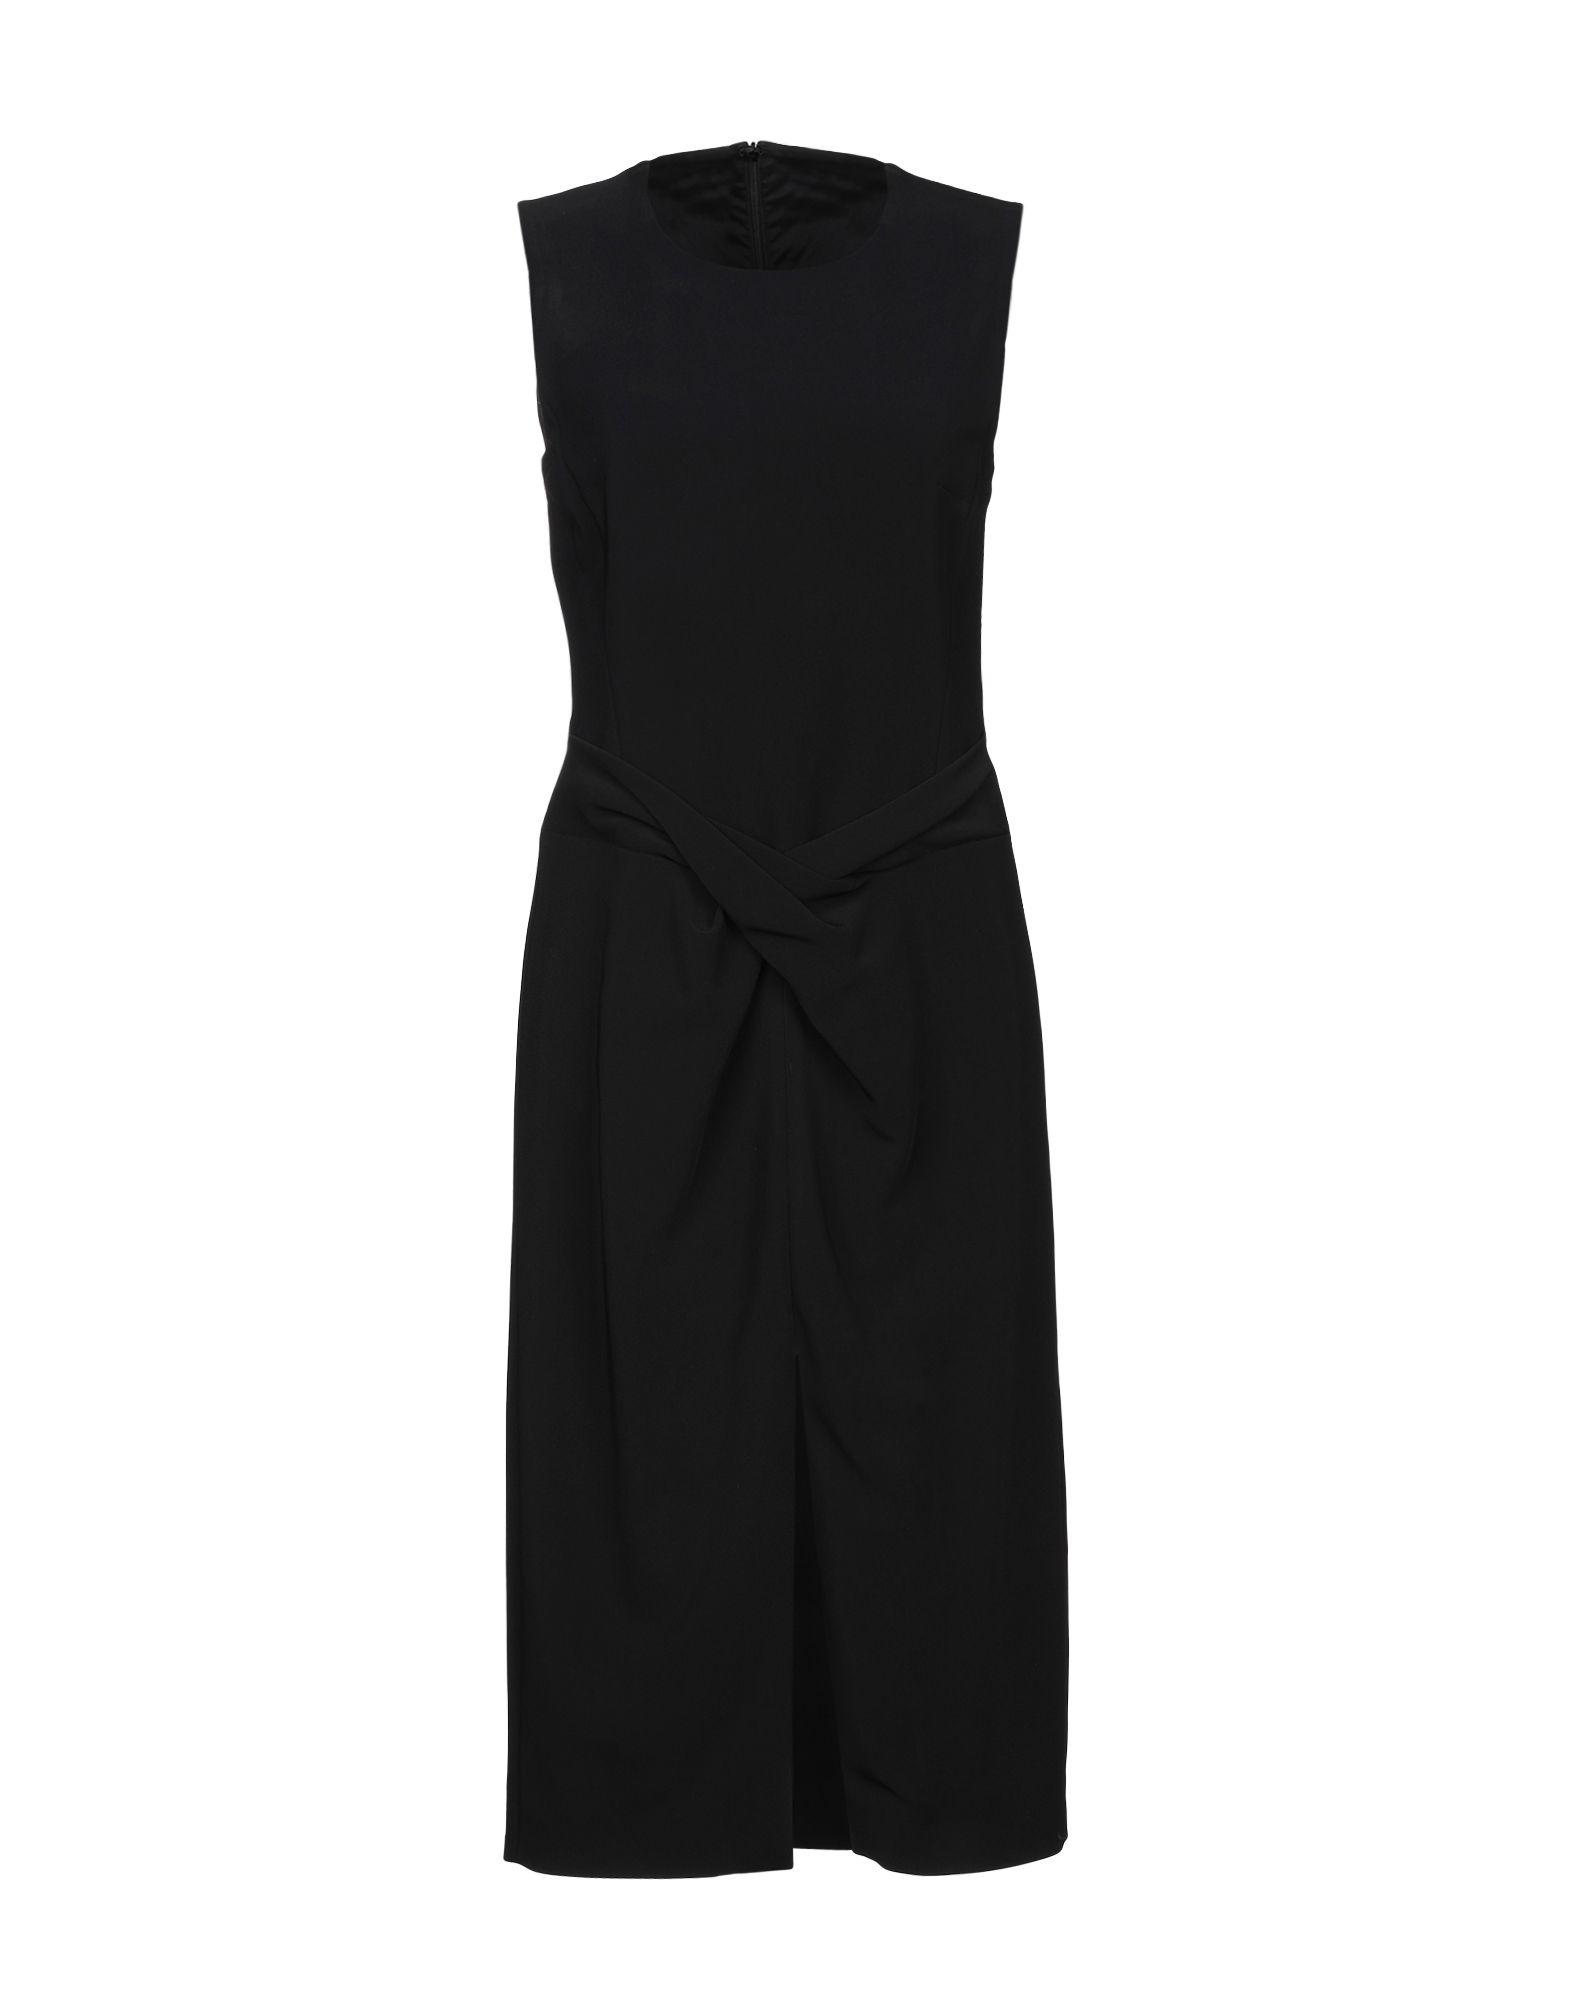 Фото - MICHAEL KORS COLLECTION Платье до колена michael kors collection платье до колена